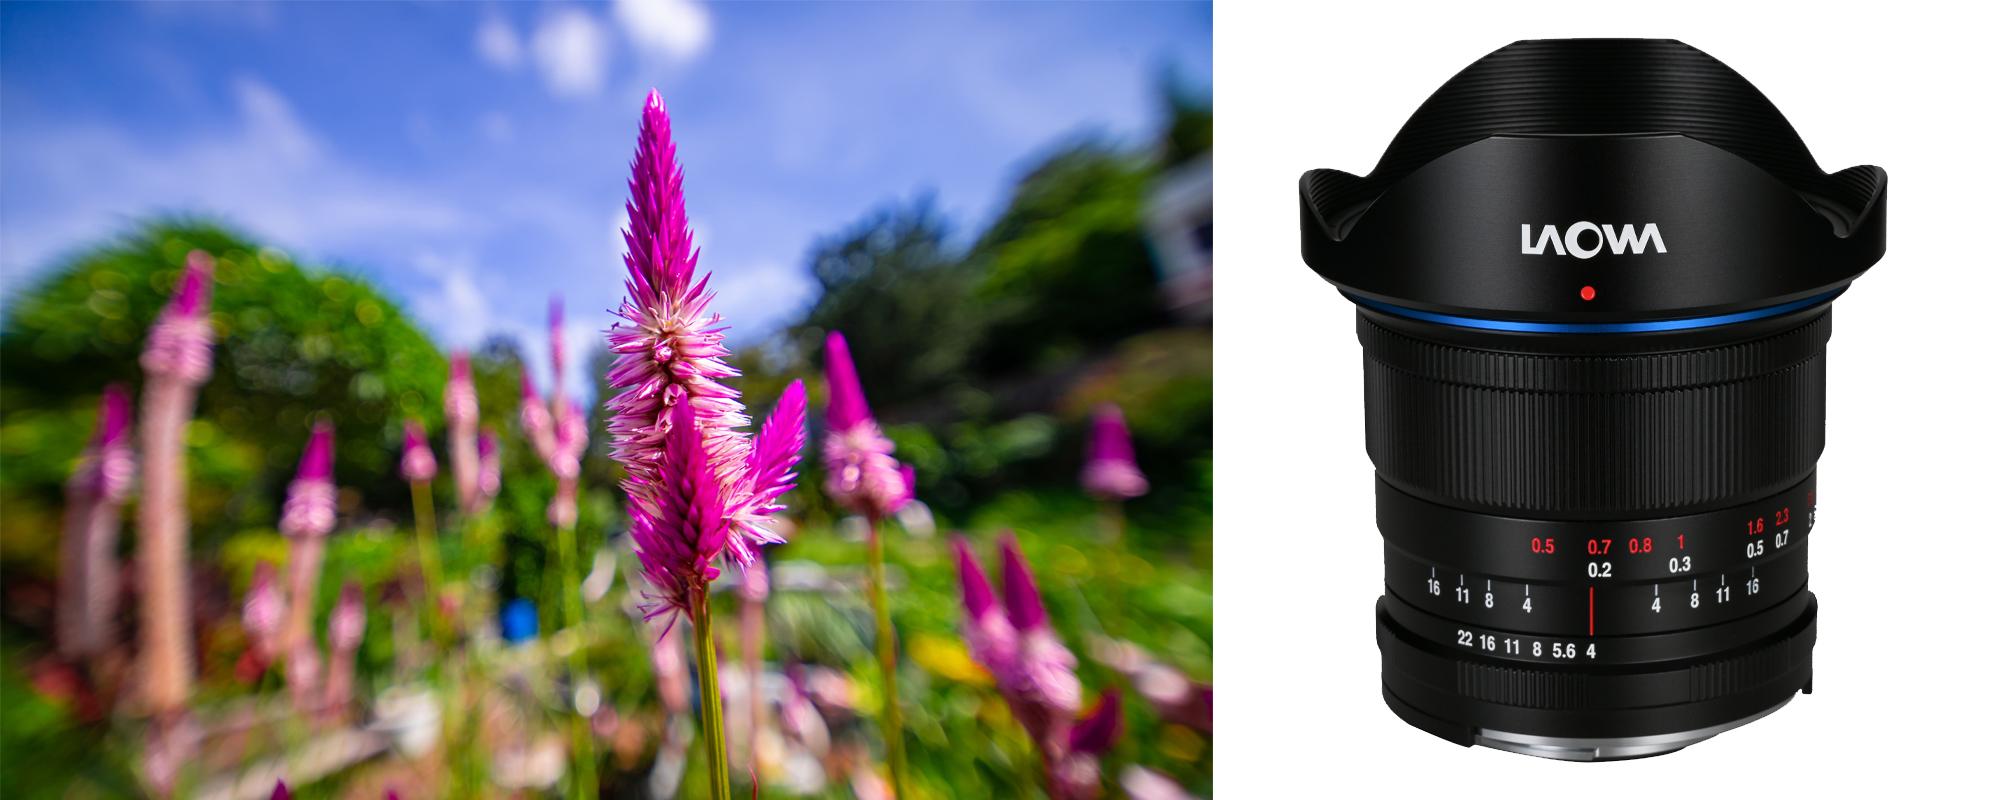 Obiektyw Venus Optics Laowa C&D-Dreamer 14 mm do Canon EF